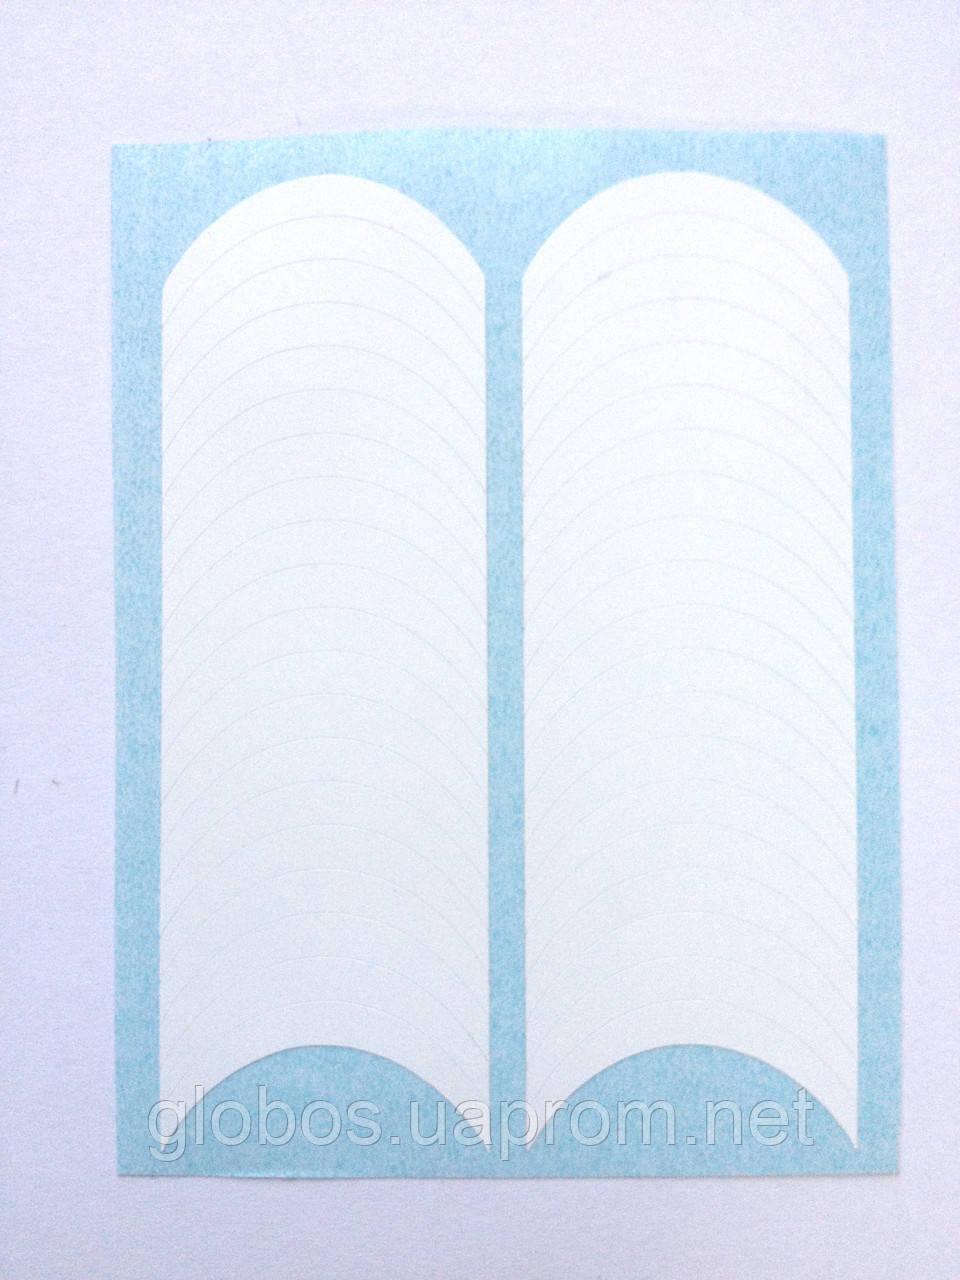 "Трафарет для французского маникюра   ""GLOBOS"" MTG 2"